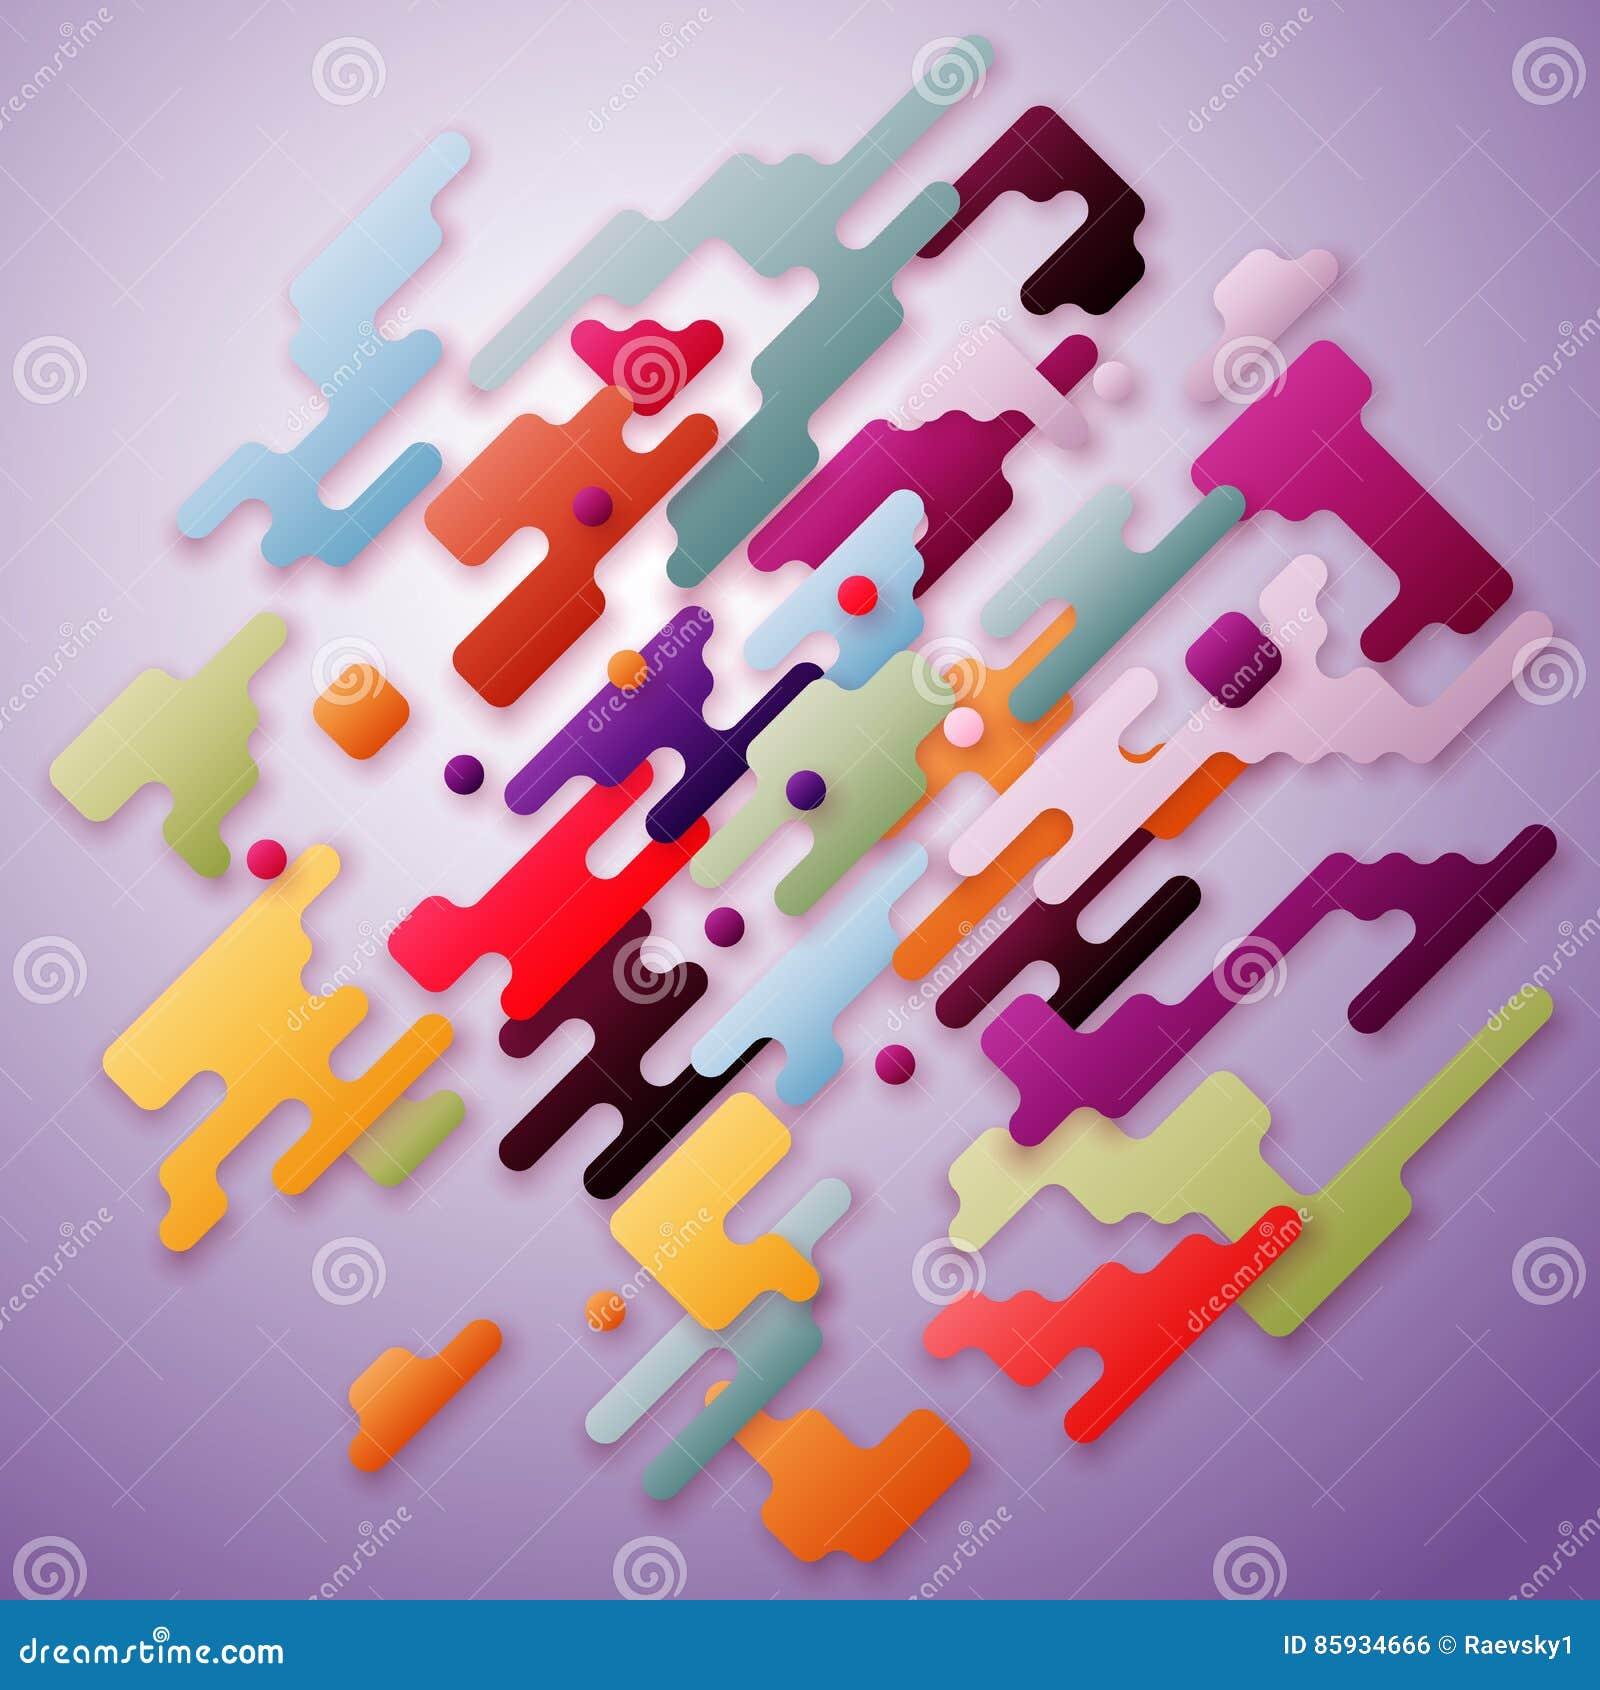 Colorful Minimalist Design: Bright Color Lines And Dots, Colorful Minimalist Design